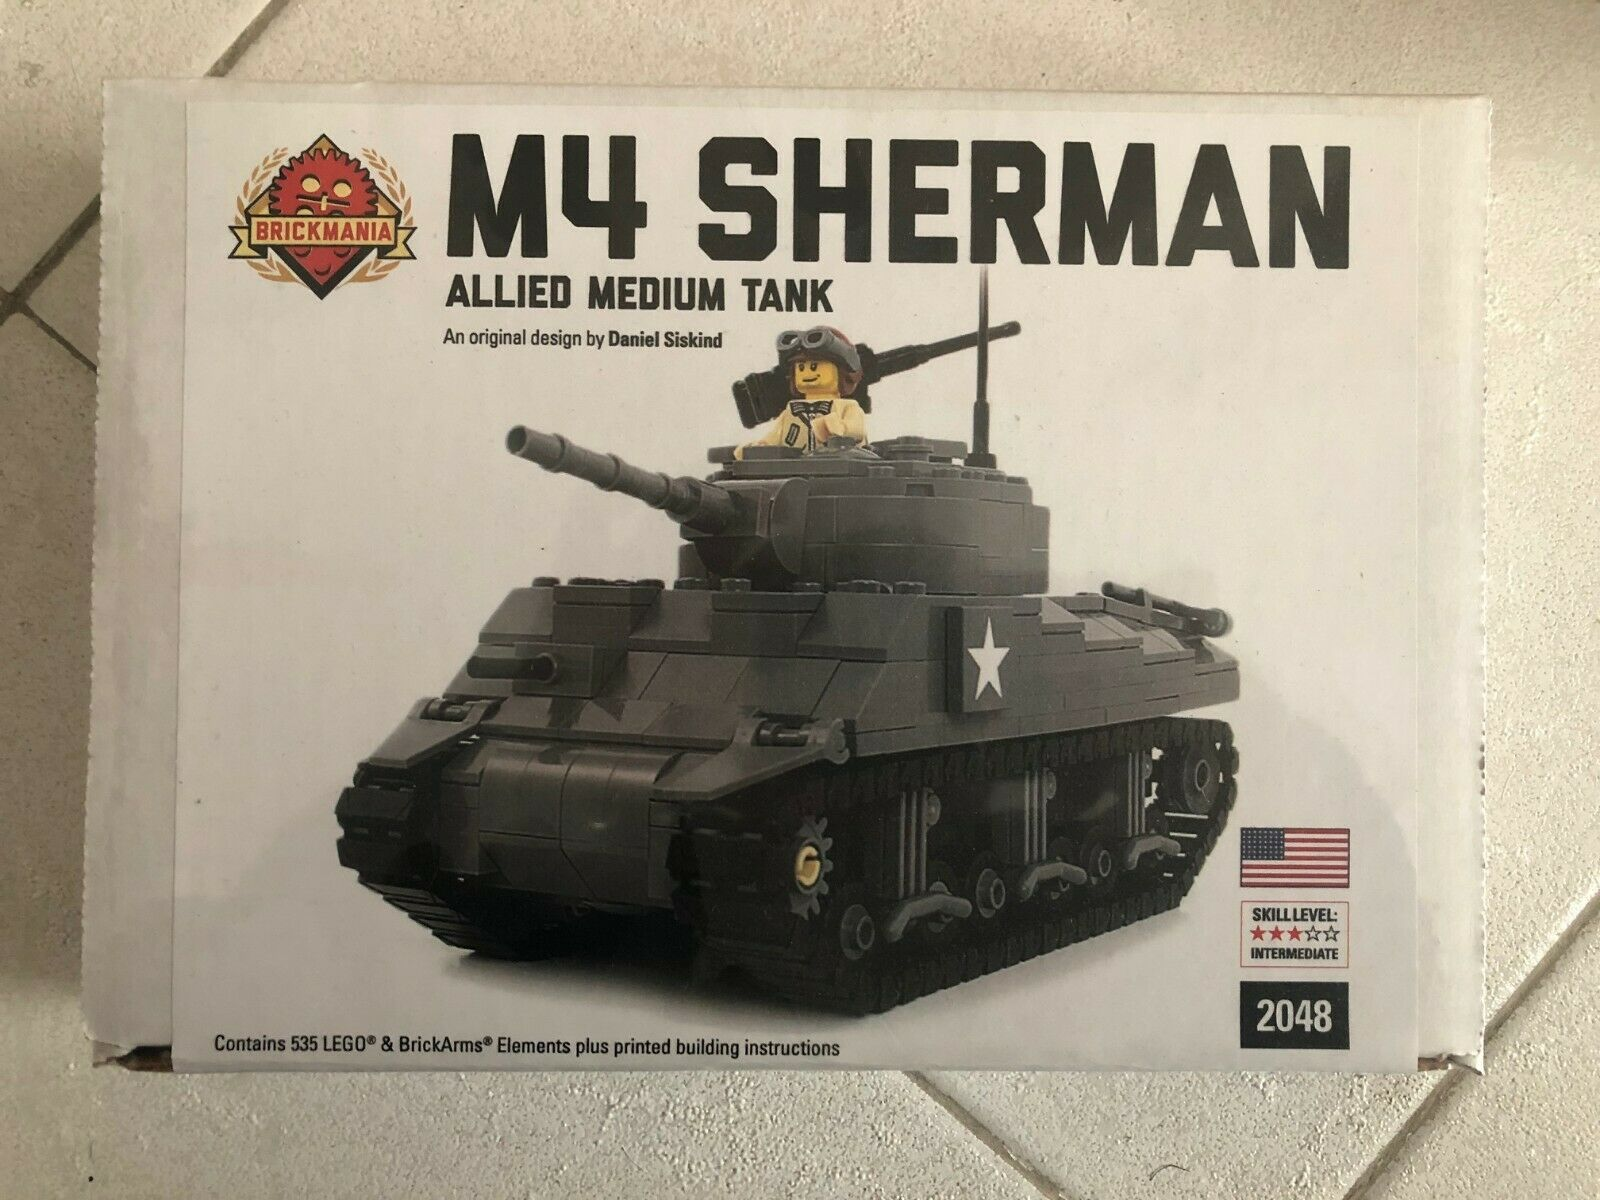 Lego Brickmania M4 Sherman Allied Medium Tank 2048 Nuovo. NEW   Ultra RARE